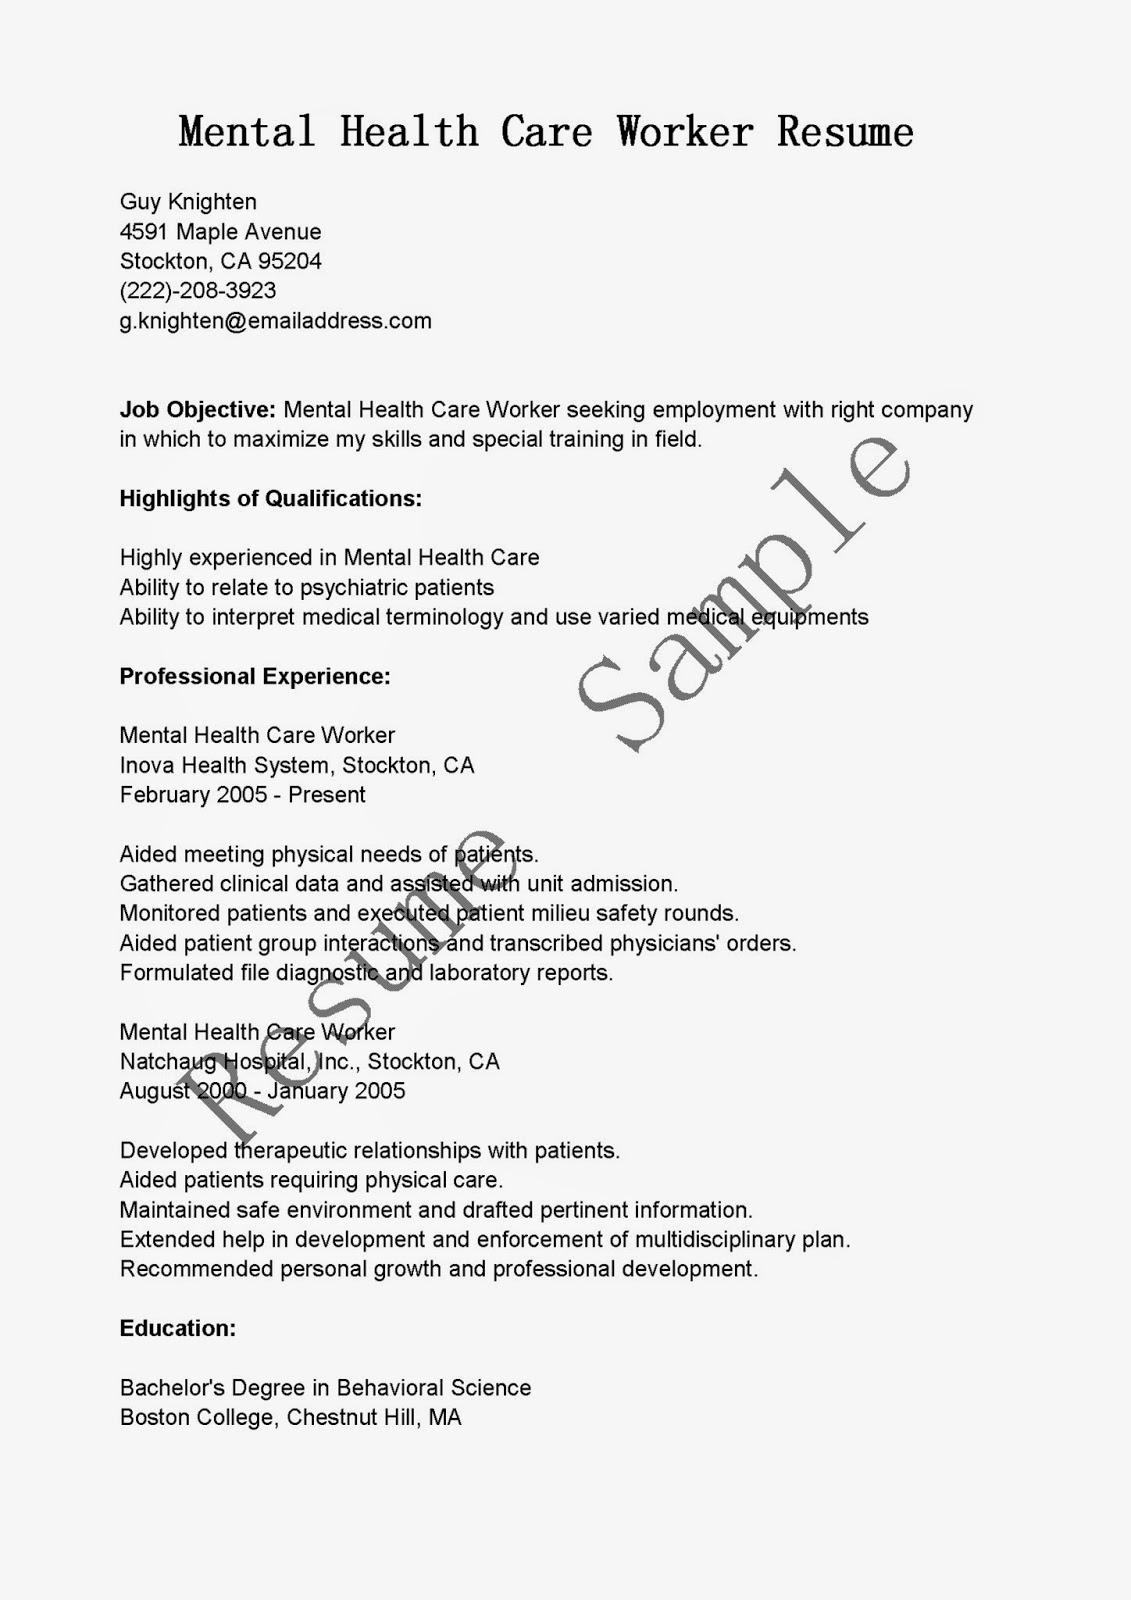 Professional Resume Writing Service Faq